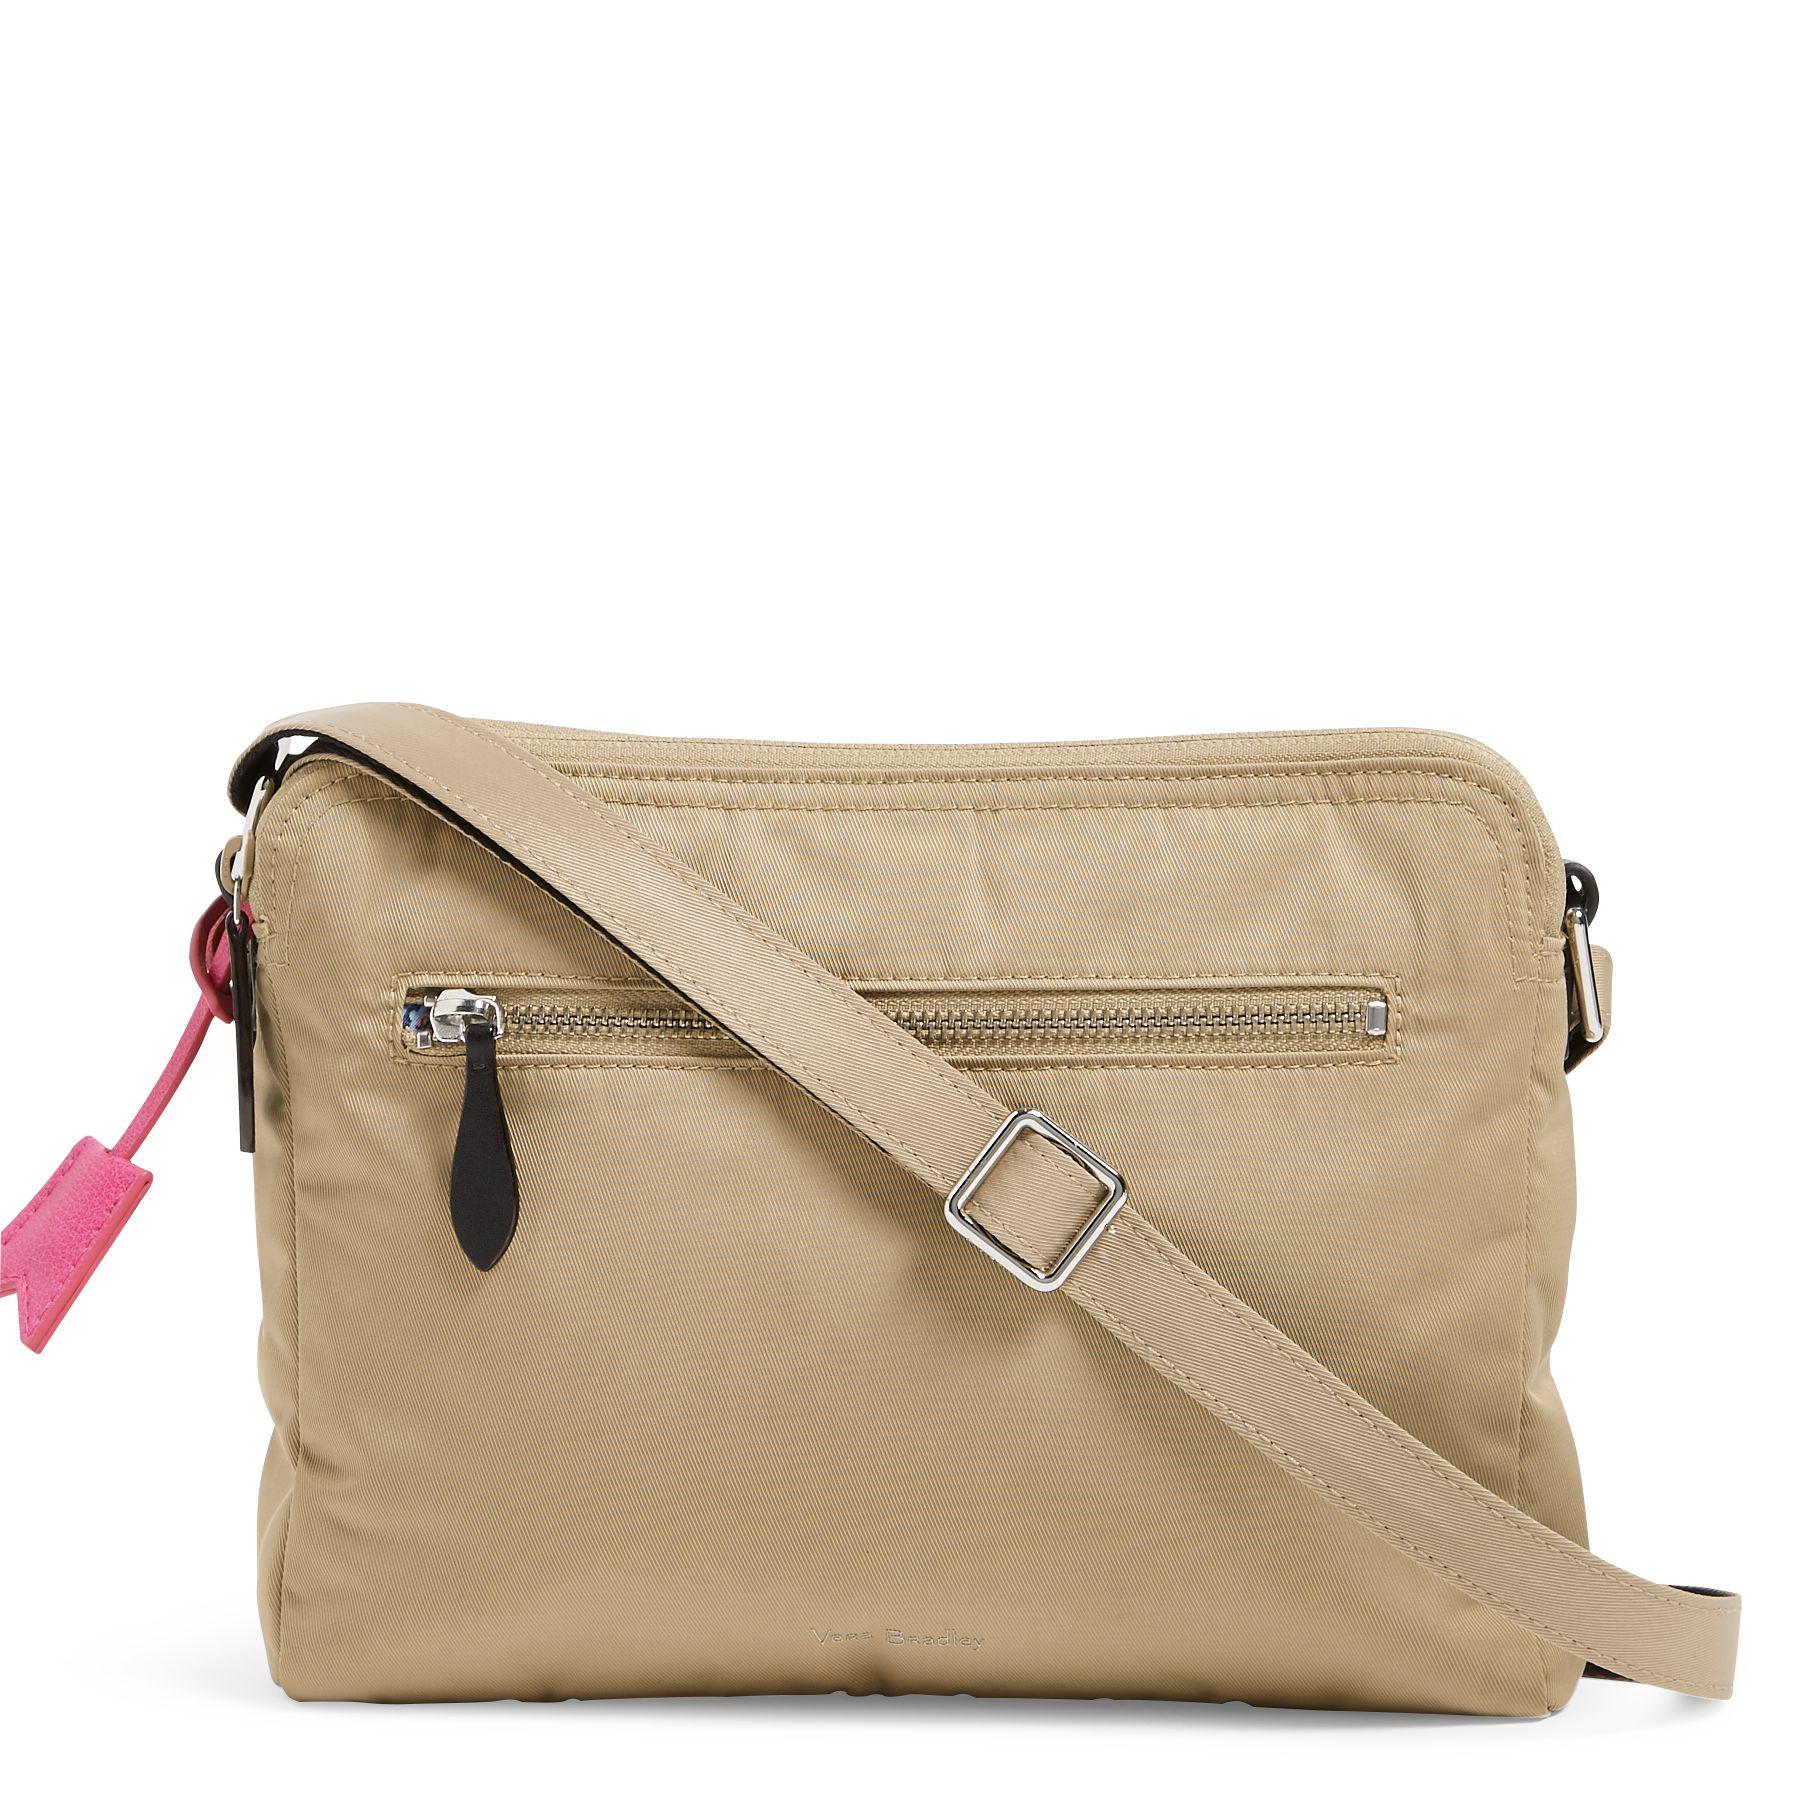 Vera Bradley Midtown Women's Crossbody Bag